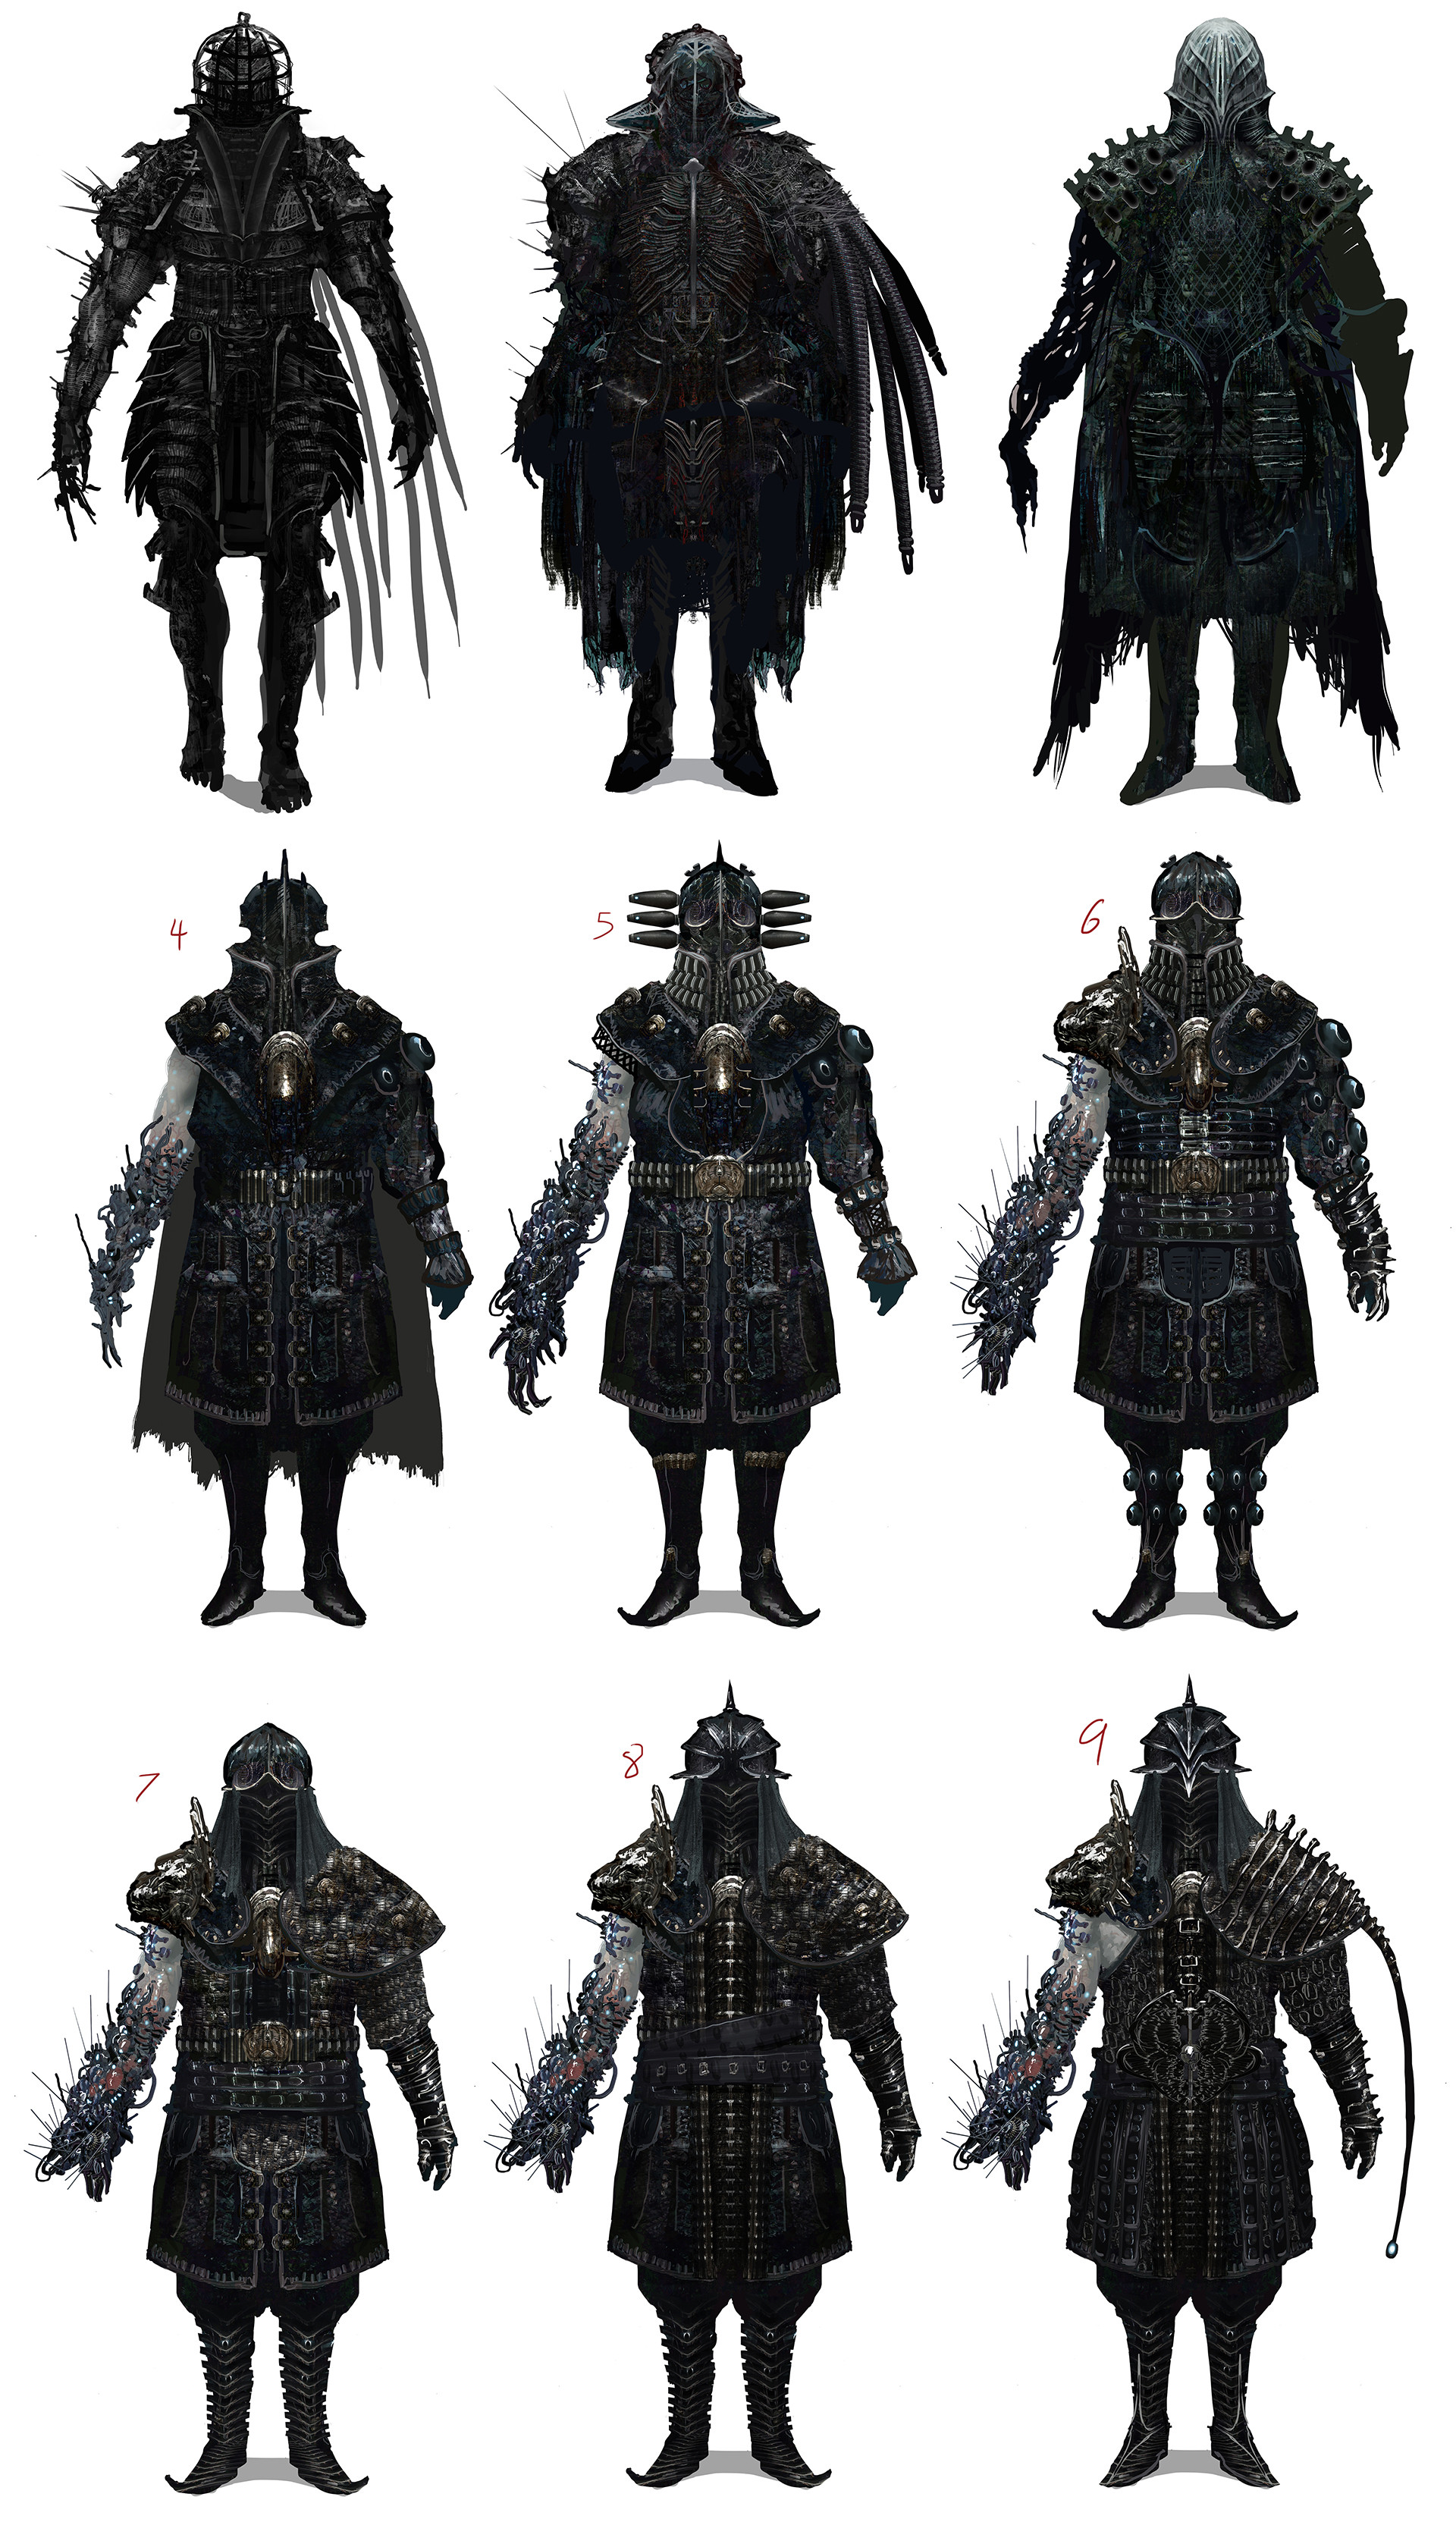 Chenthooran nambiarooran brothers harrow knights